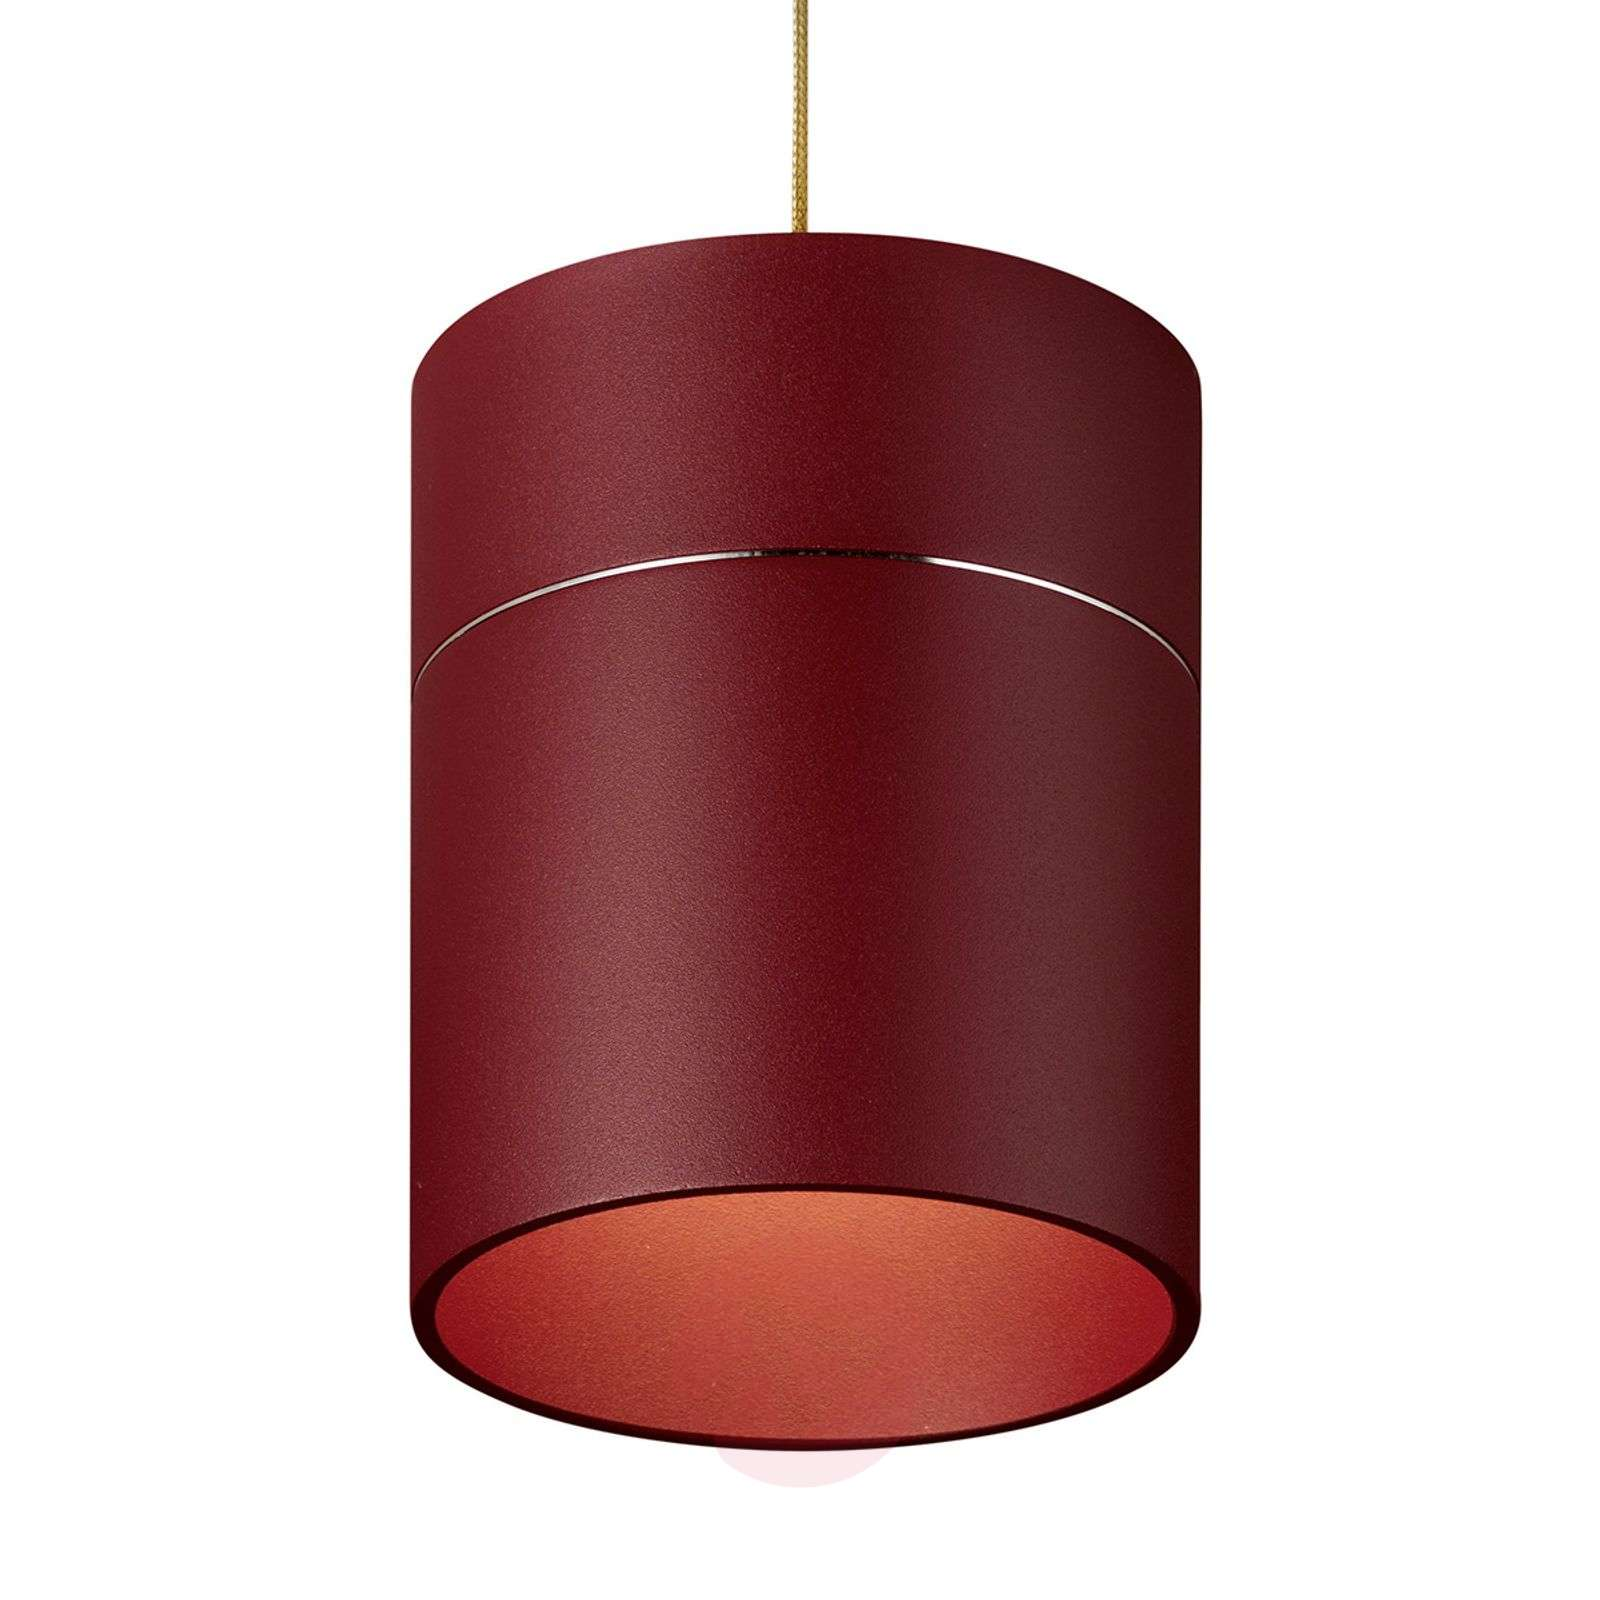 Tudor M riippuvalo 13,9 cm varjostinkorkeus puna.-7250467-01